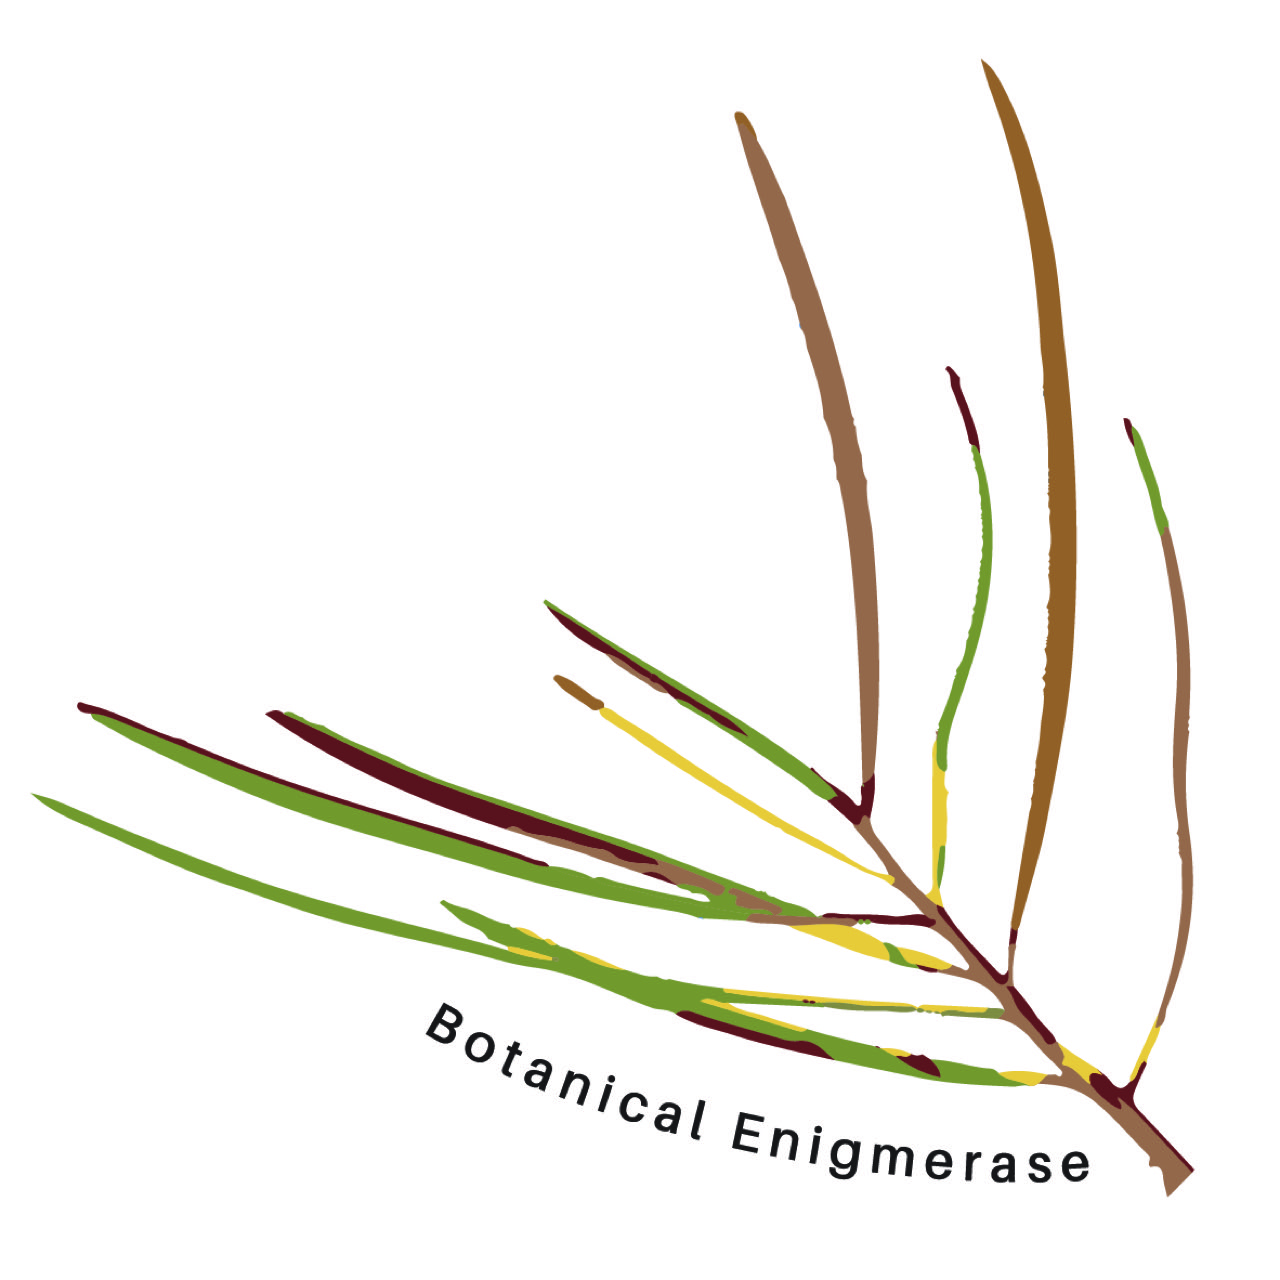 Botanical Enigmerase